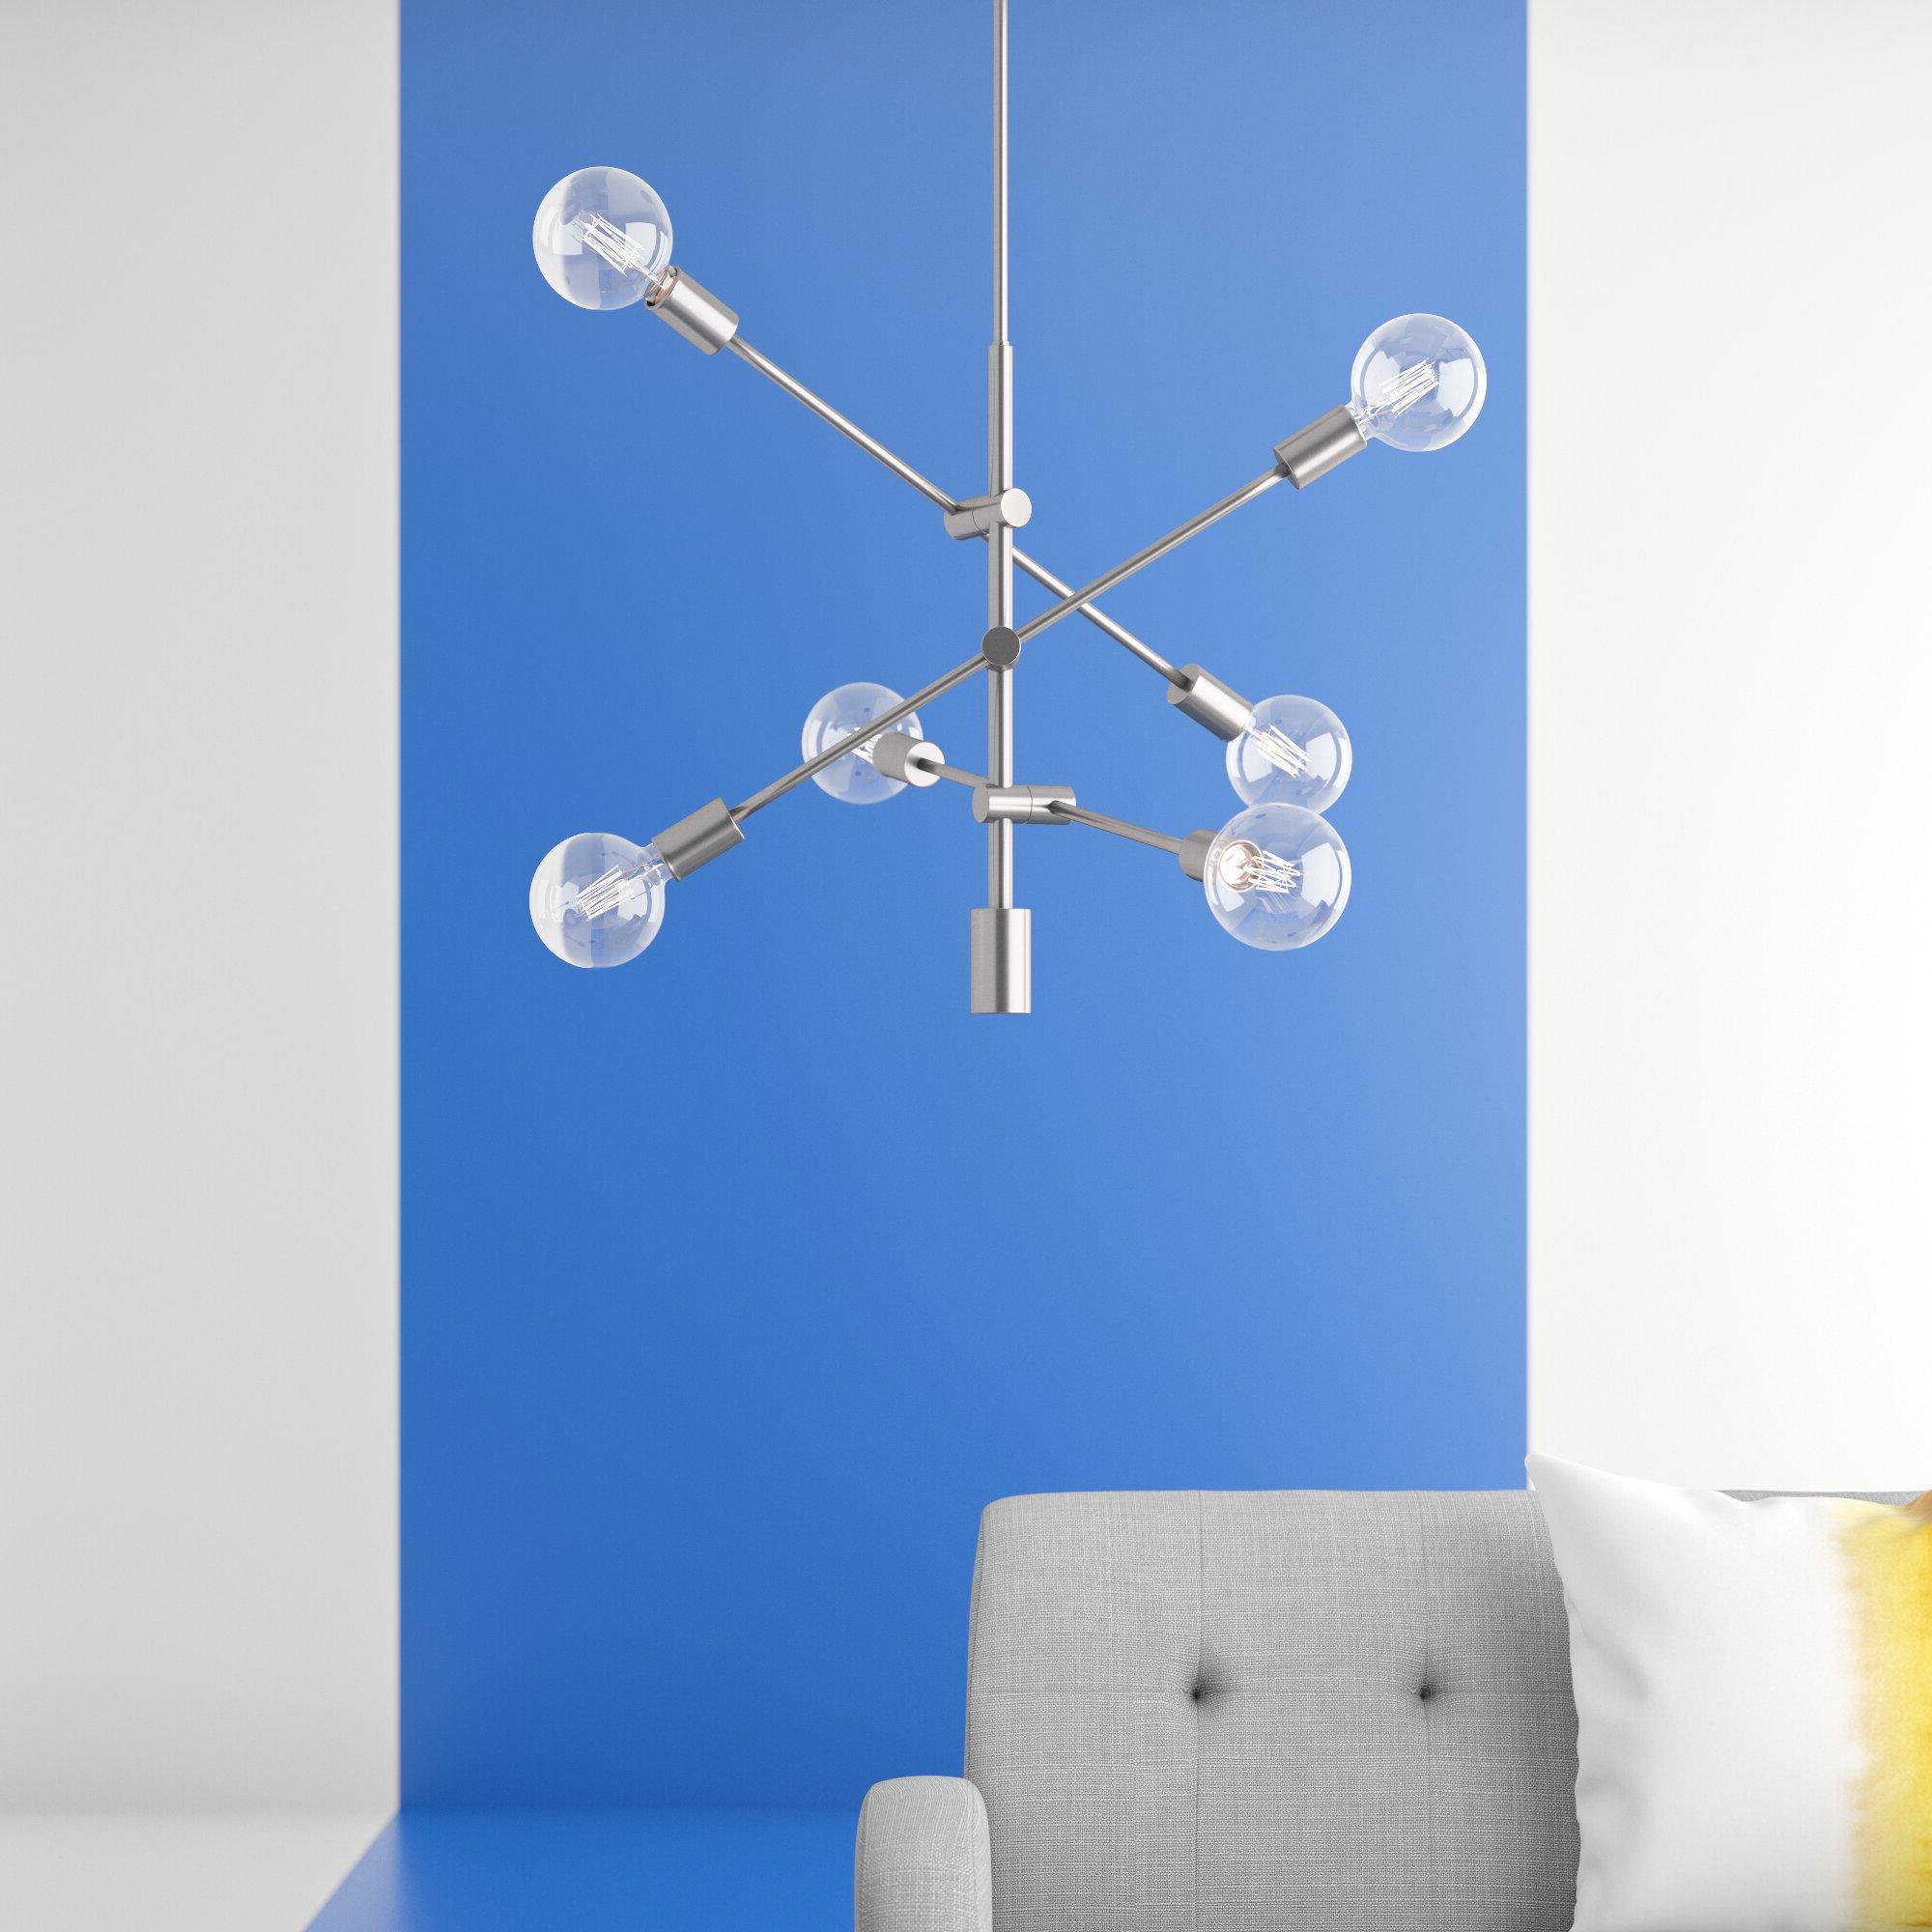 2019 Eladia 6 Light Sputnik Chandeliers Pertaining To Eladia 6 Light Sputnik Chandelier (Gallery 2 of 20)